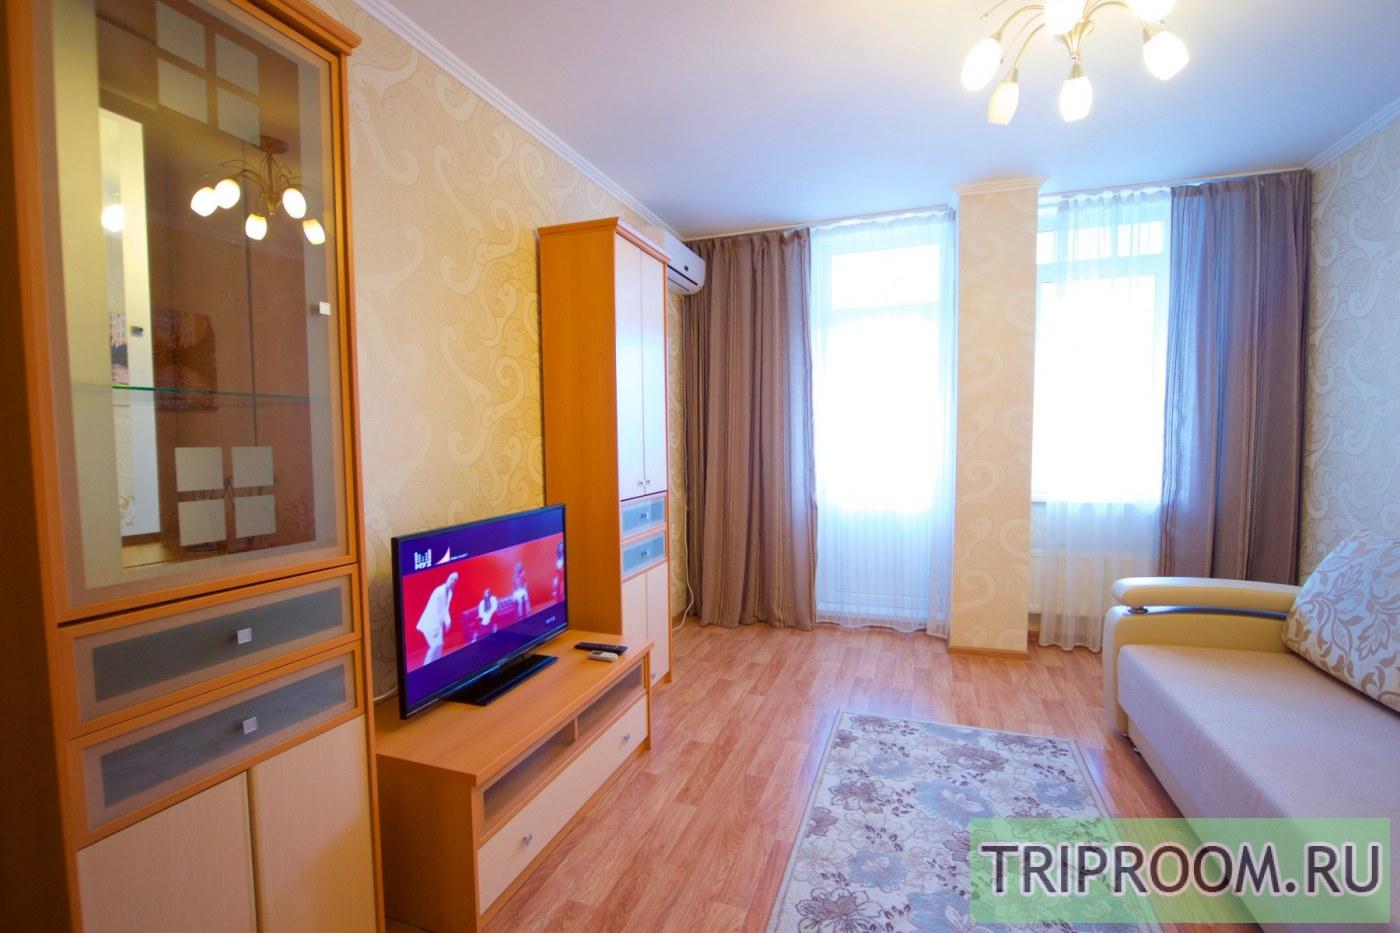 1-комнатная квартира посуточно (вариант № 40369), ул. Алексеева улица, фото № 4